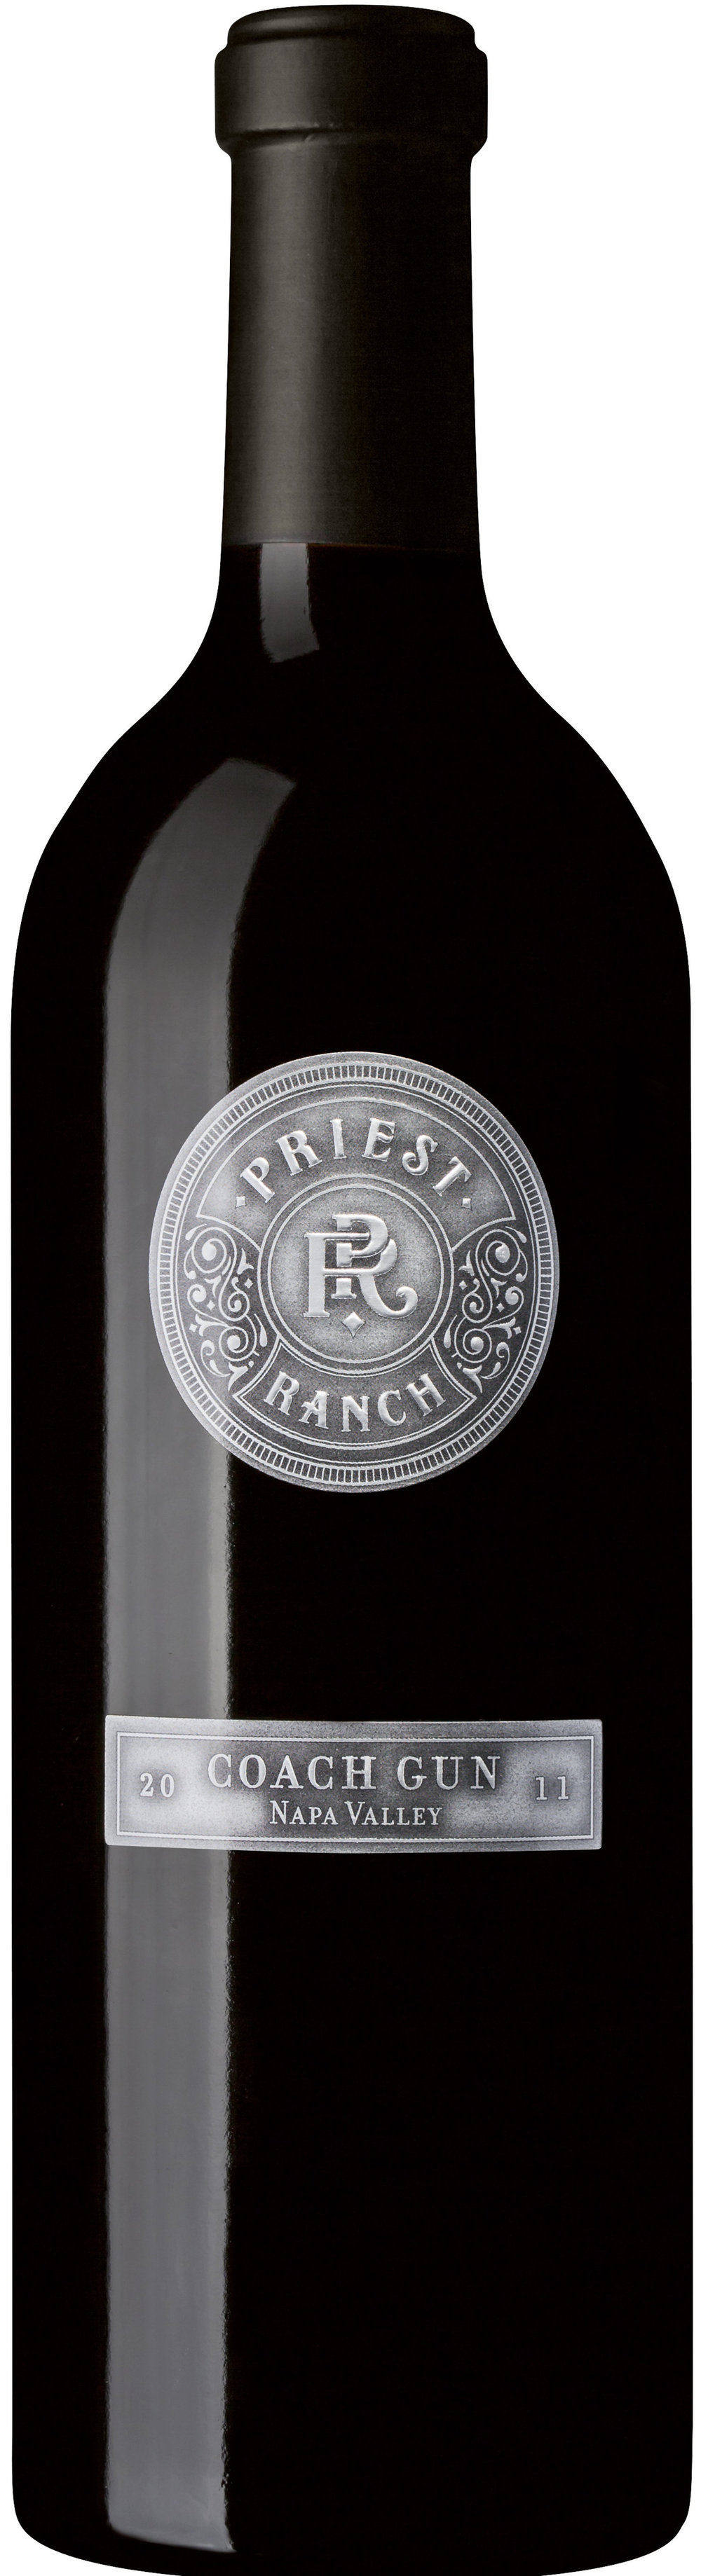 Priest Ranch – Coach Gun 2013, Napa